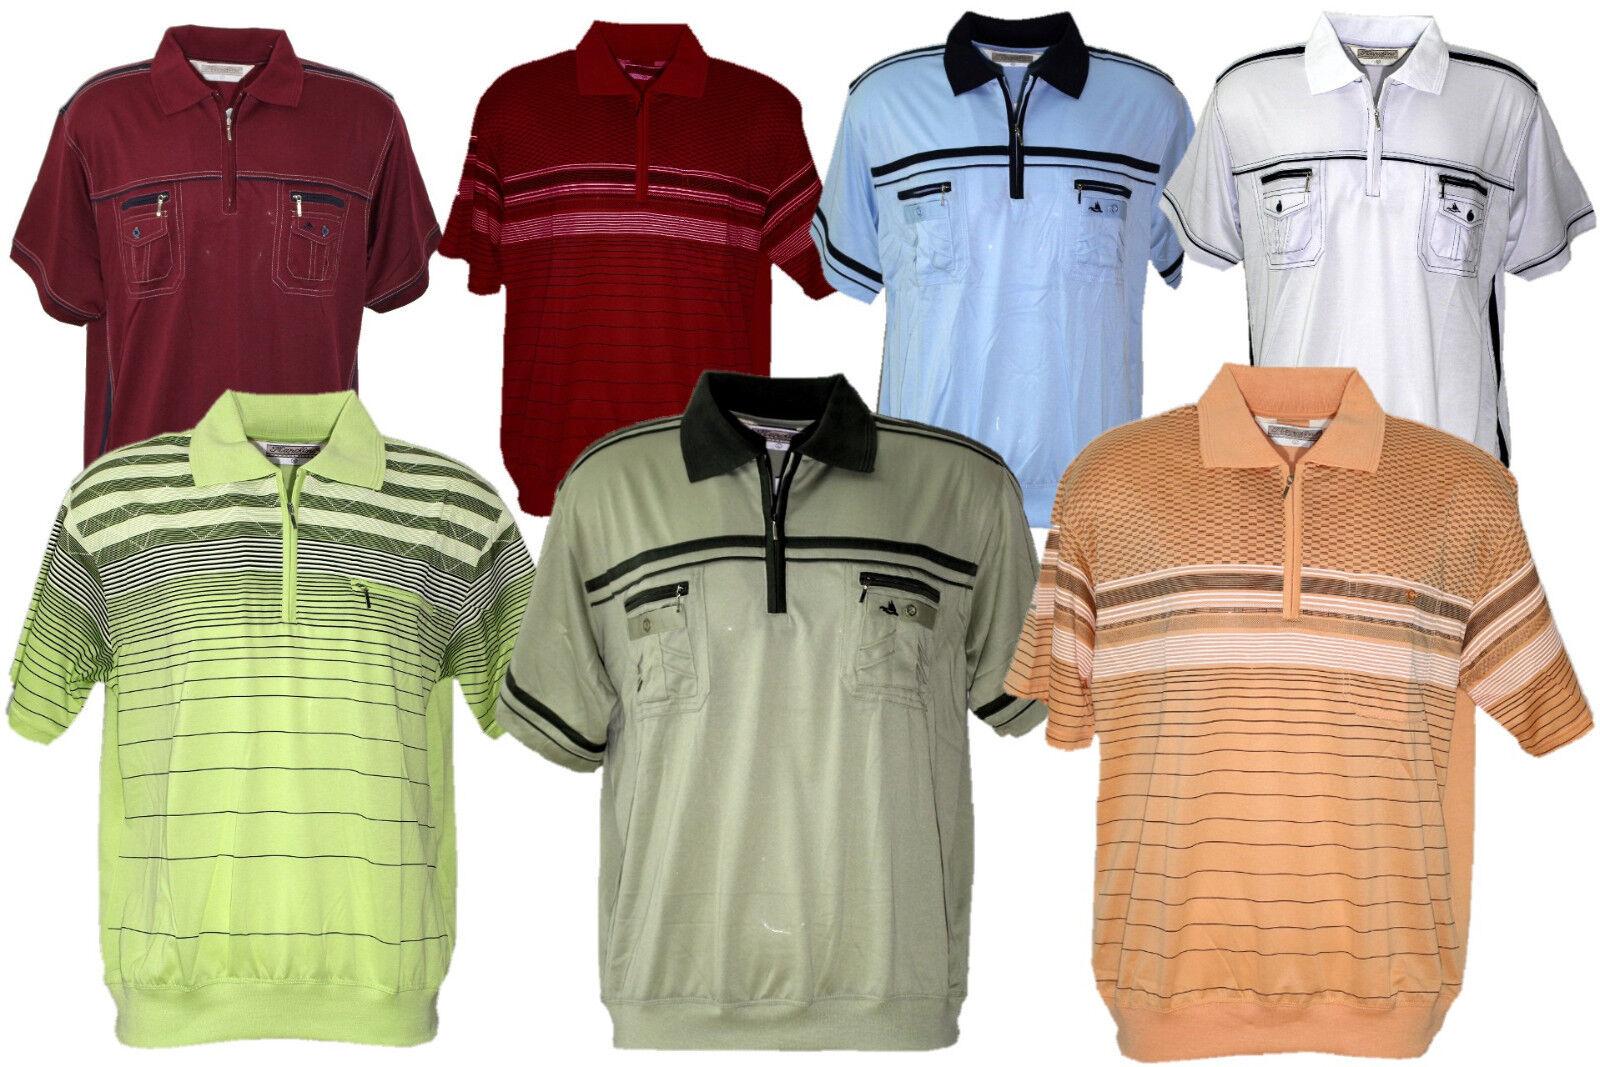 Herren Sommer Sweatshirt, Polohemd, Pullover , Poloshirt kurz Arm T-Shirt  Pl1 ... b5a73b2b72